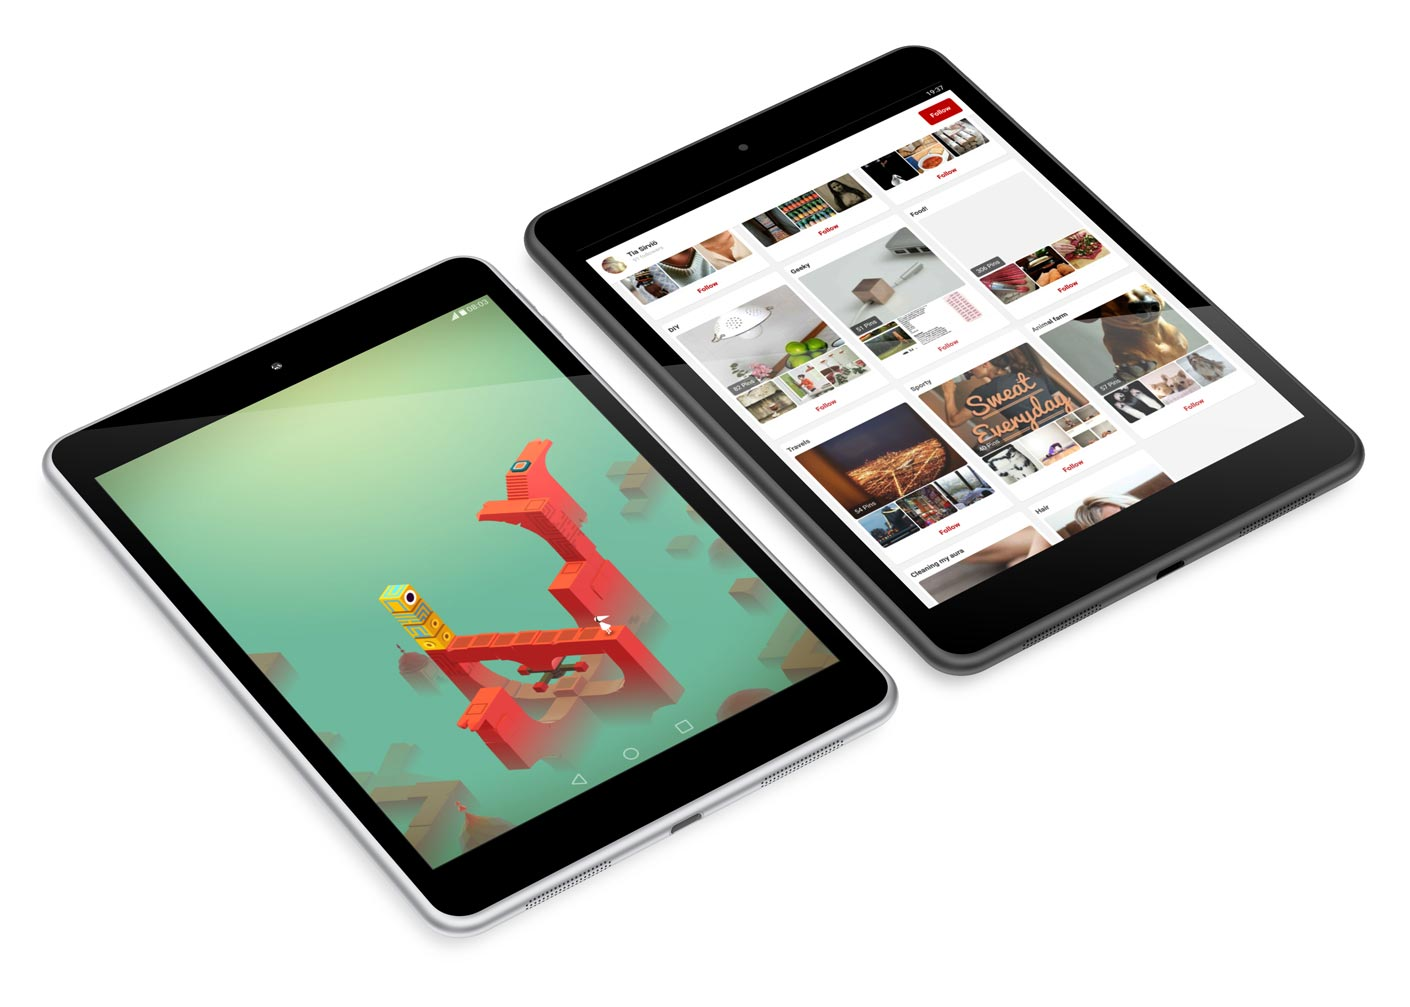 Nokia N1 tablets